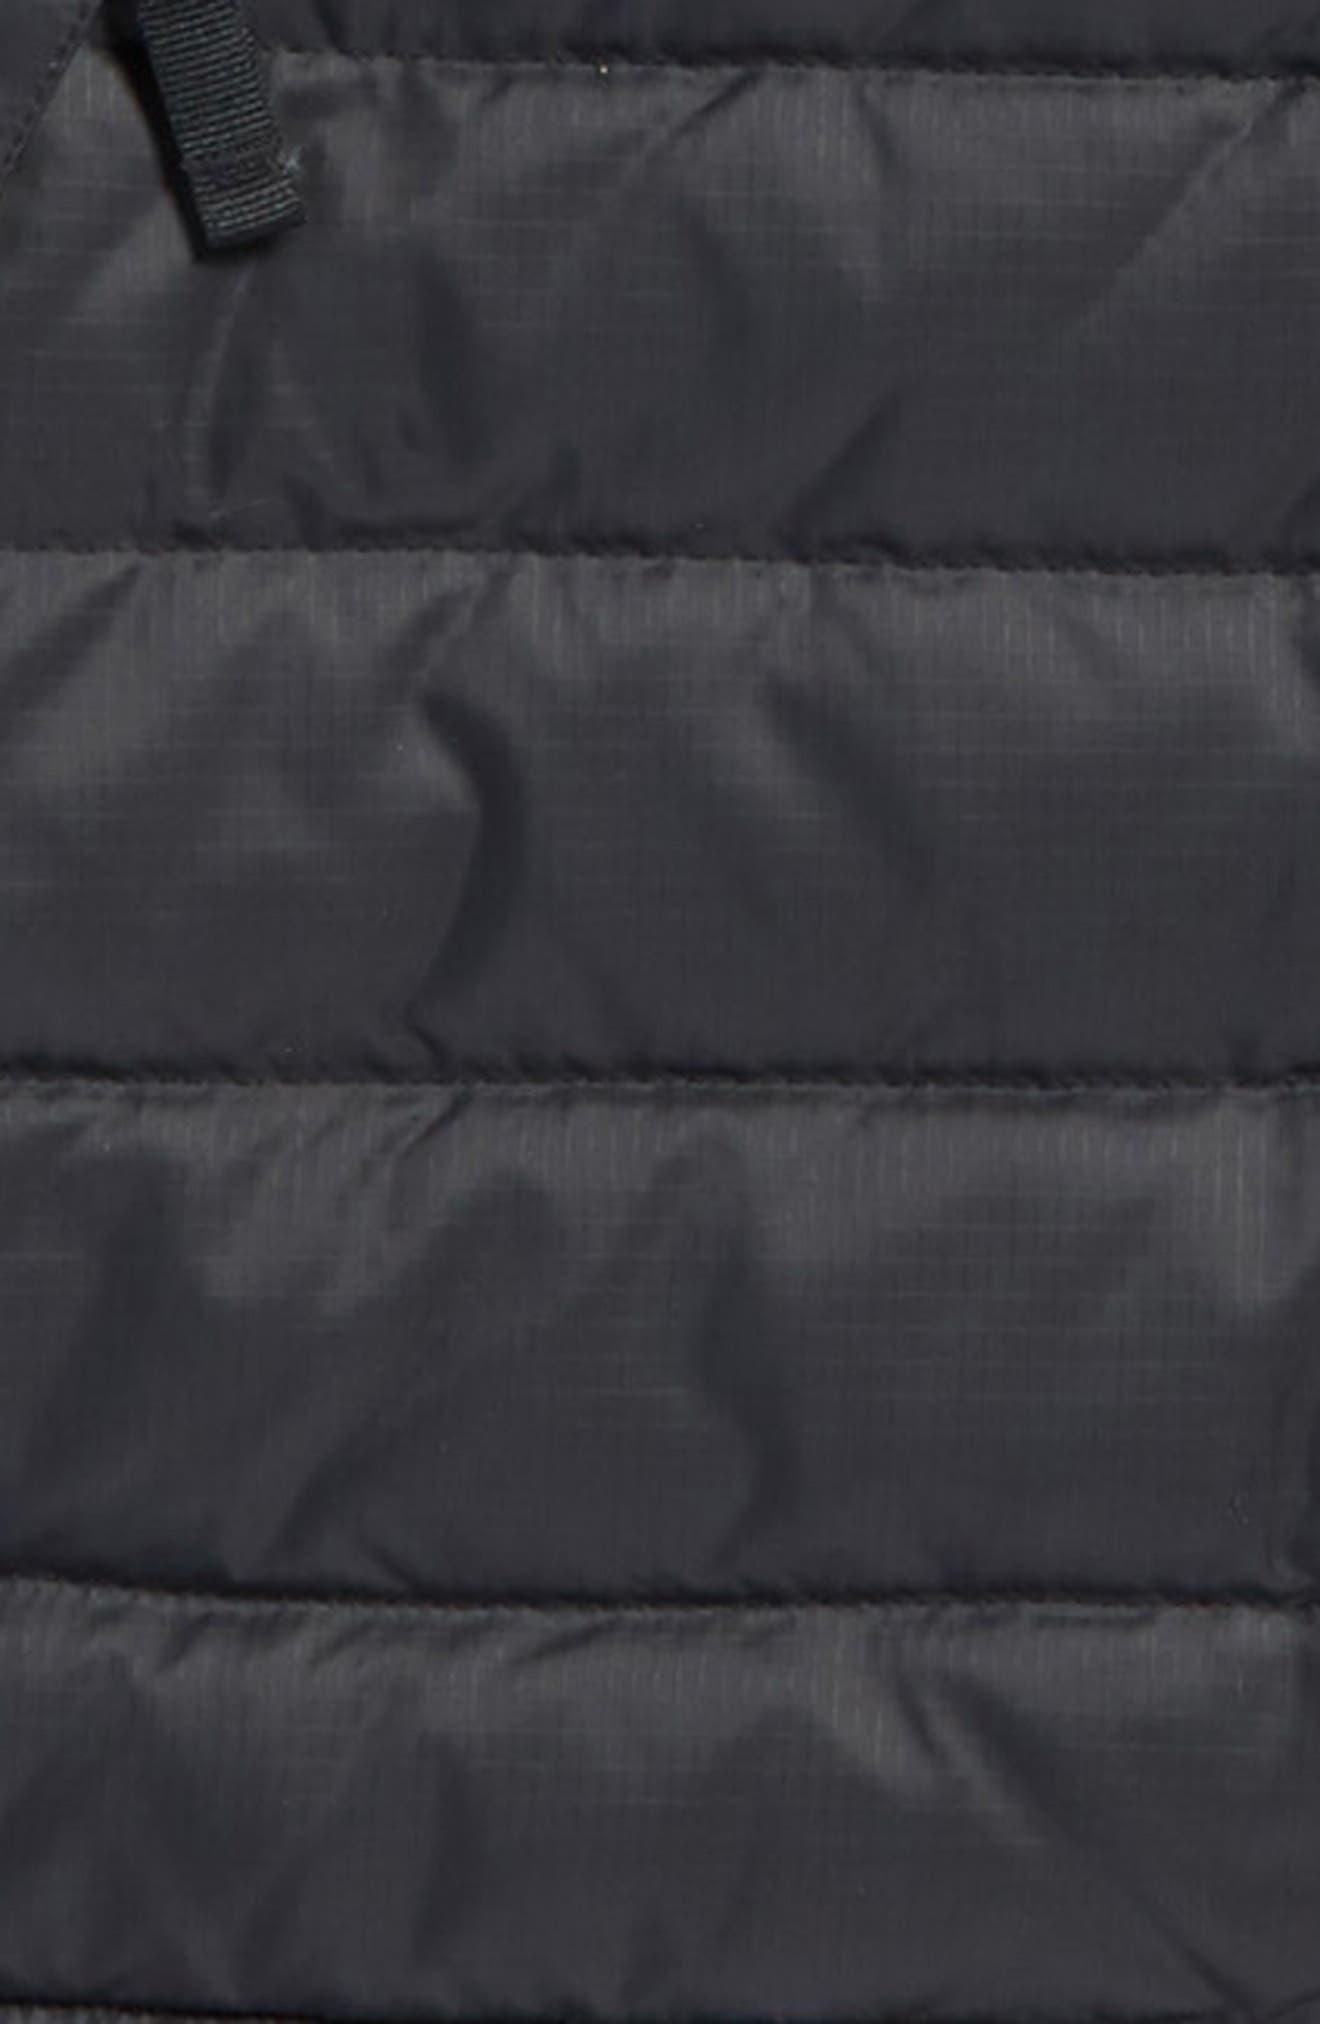 Aconcagua 550-Fill Power Down Jacket,                             Alternate thumbnail 2, color,                             001